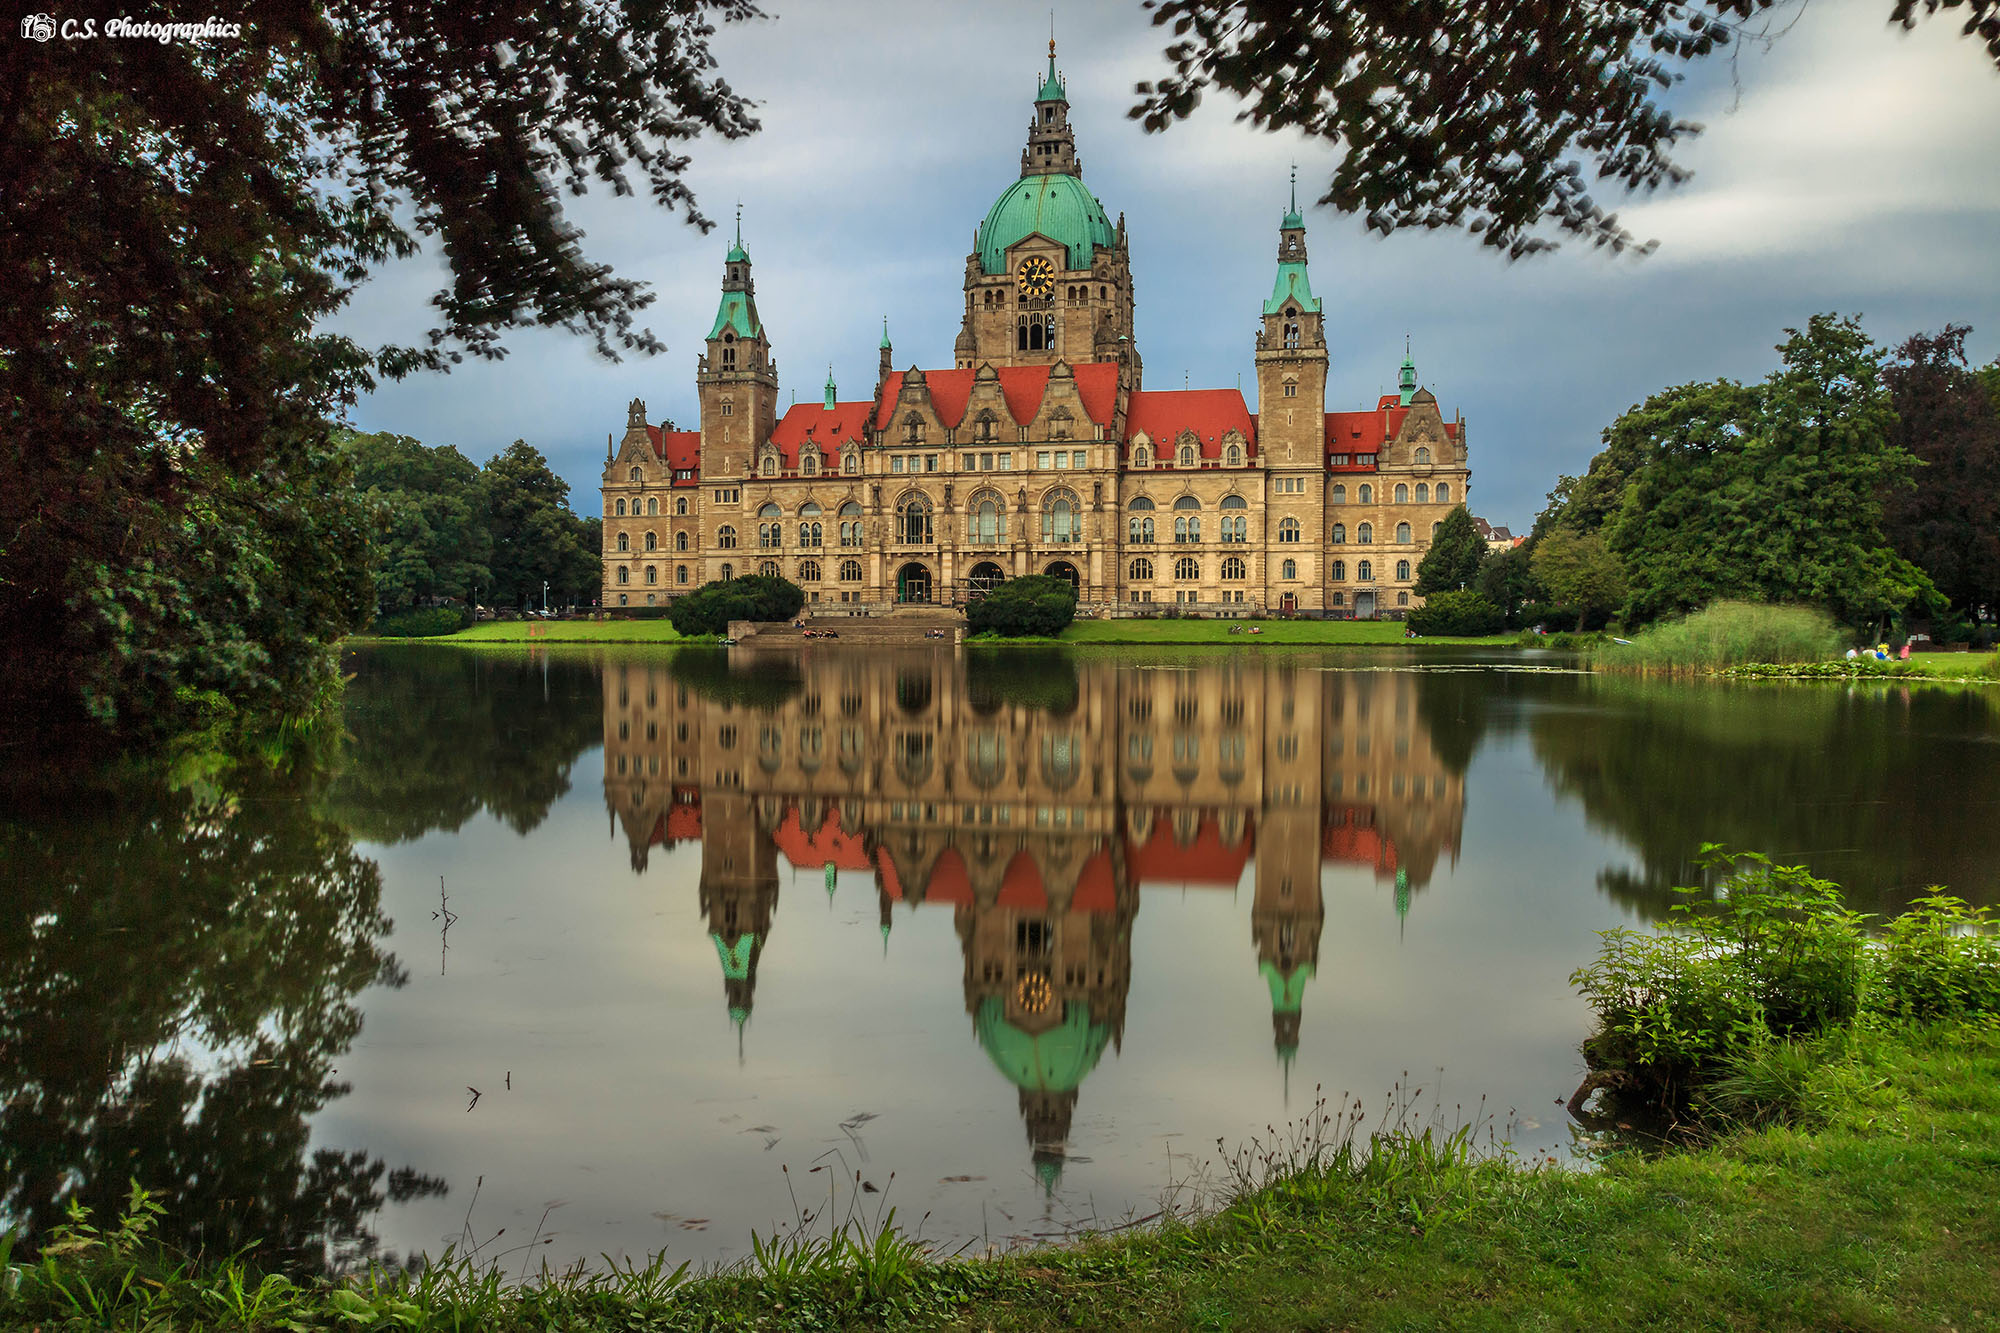 Neues Rathaus Hannover,Niedersachsen, Germany